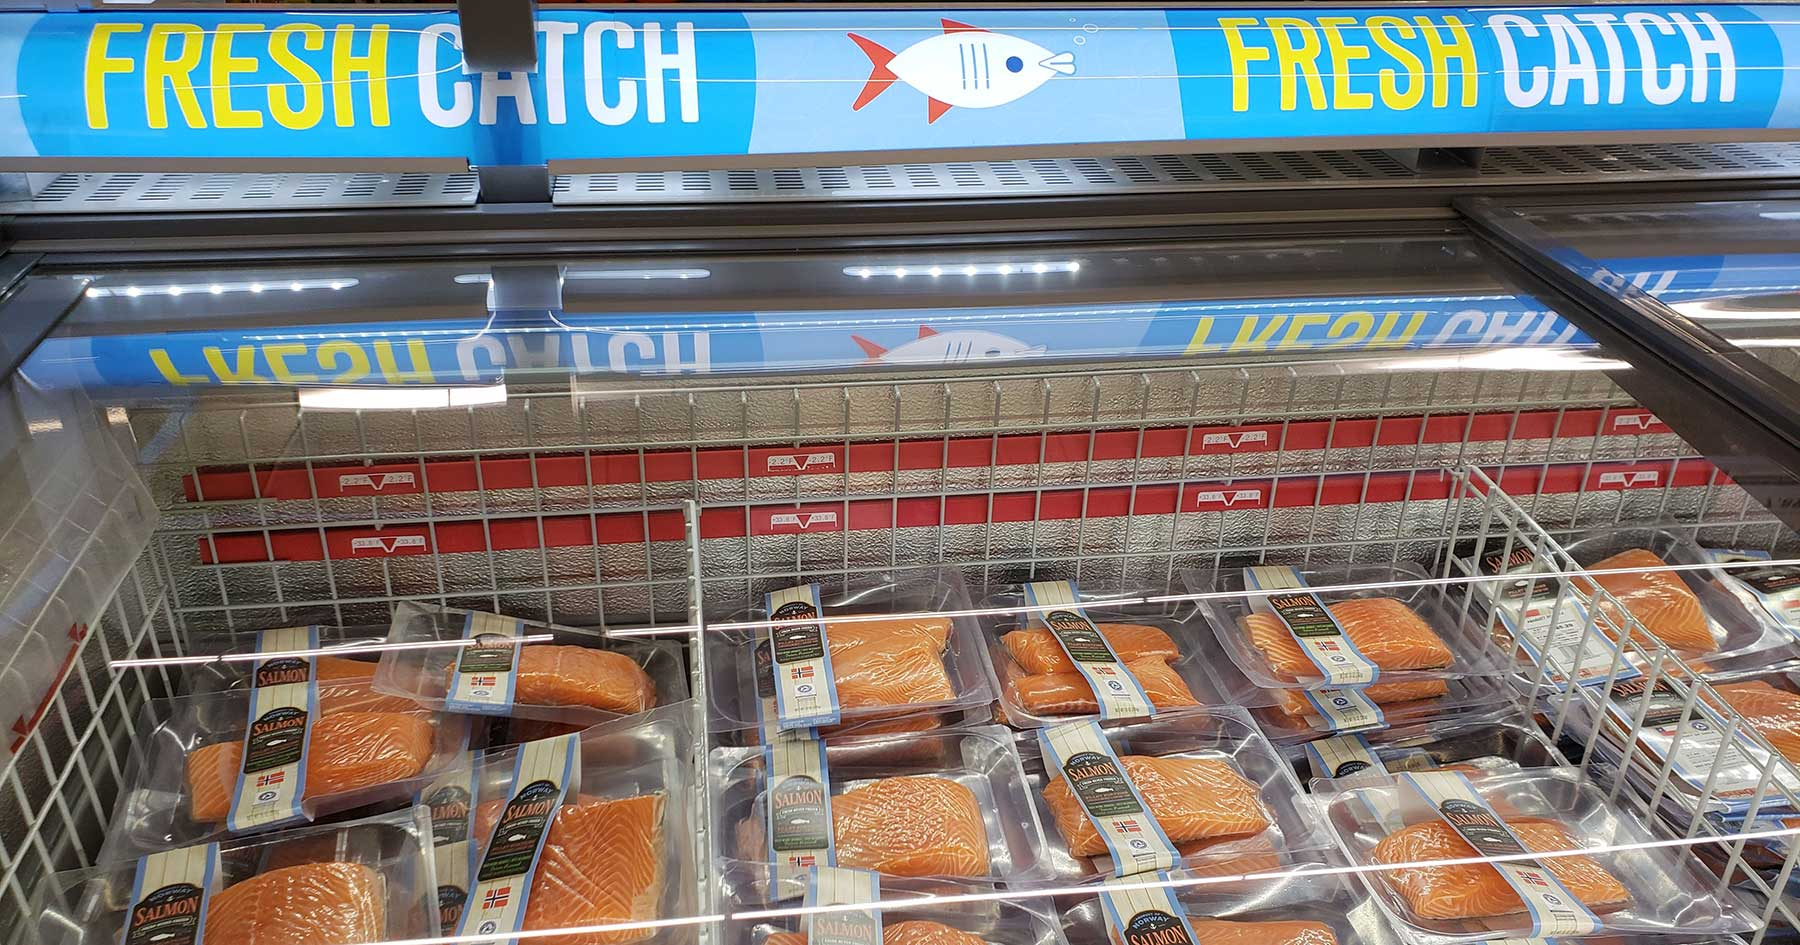 lidl fish